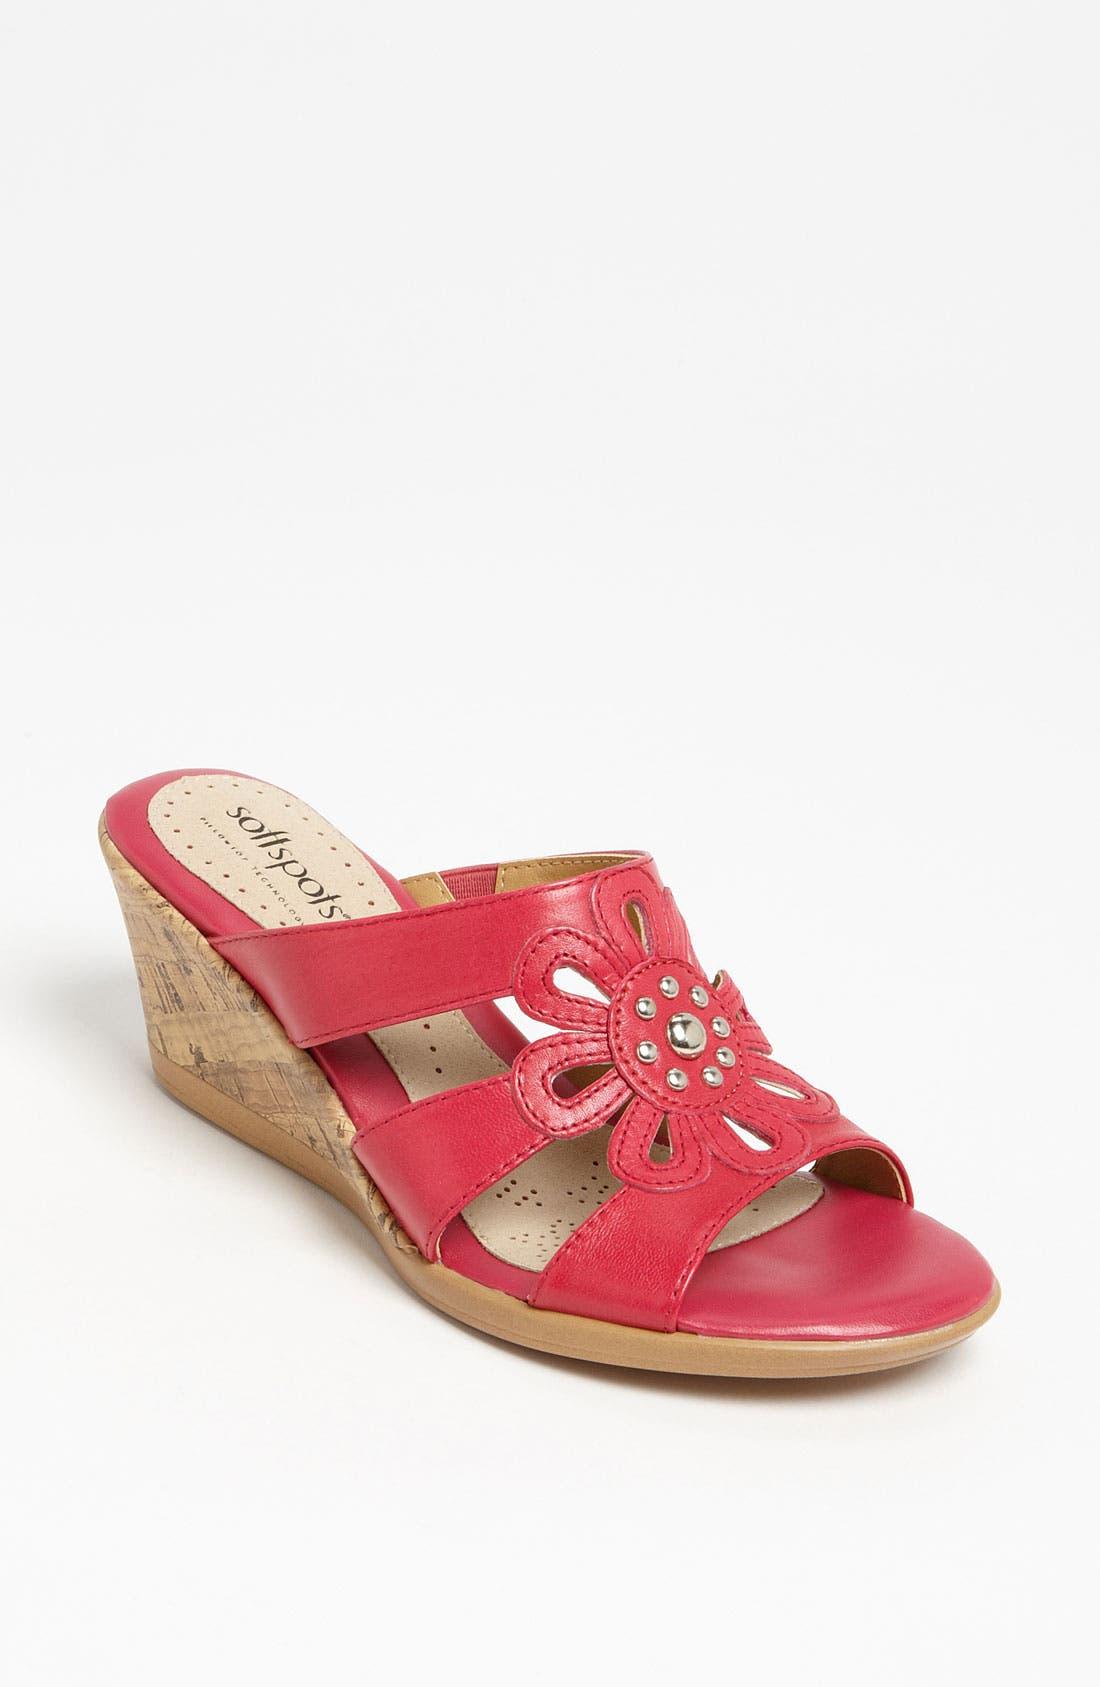 Alternate Image 1 Selected - Softspots 'Lilianna' Wedge Sandal